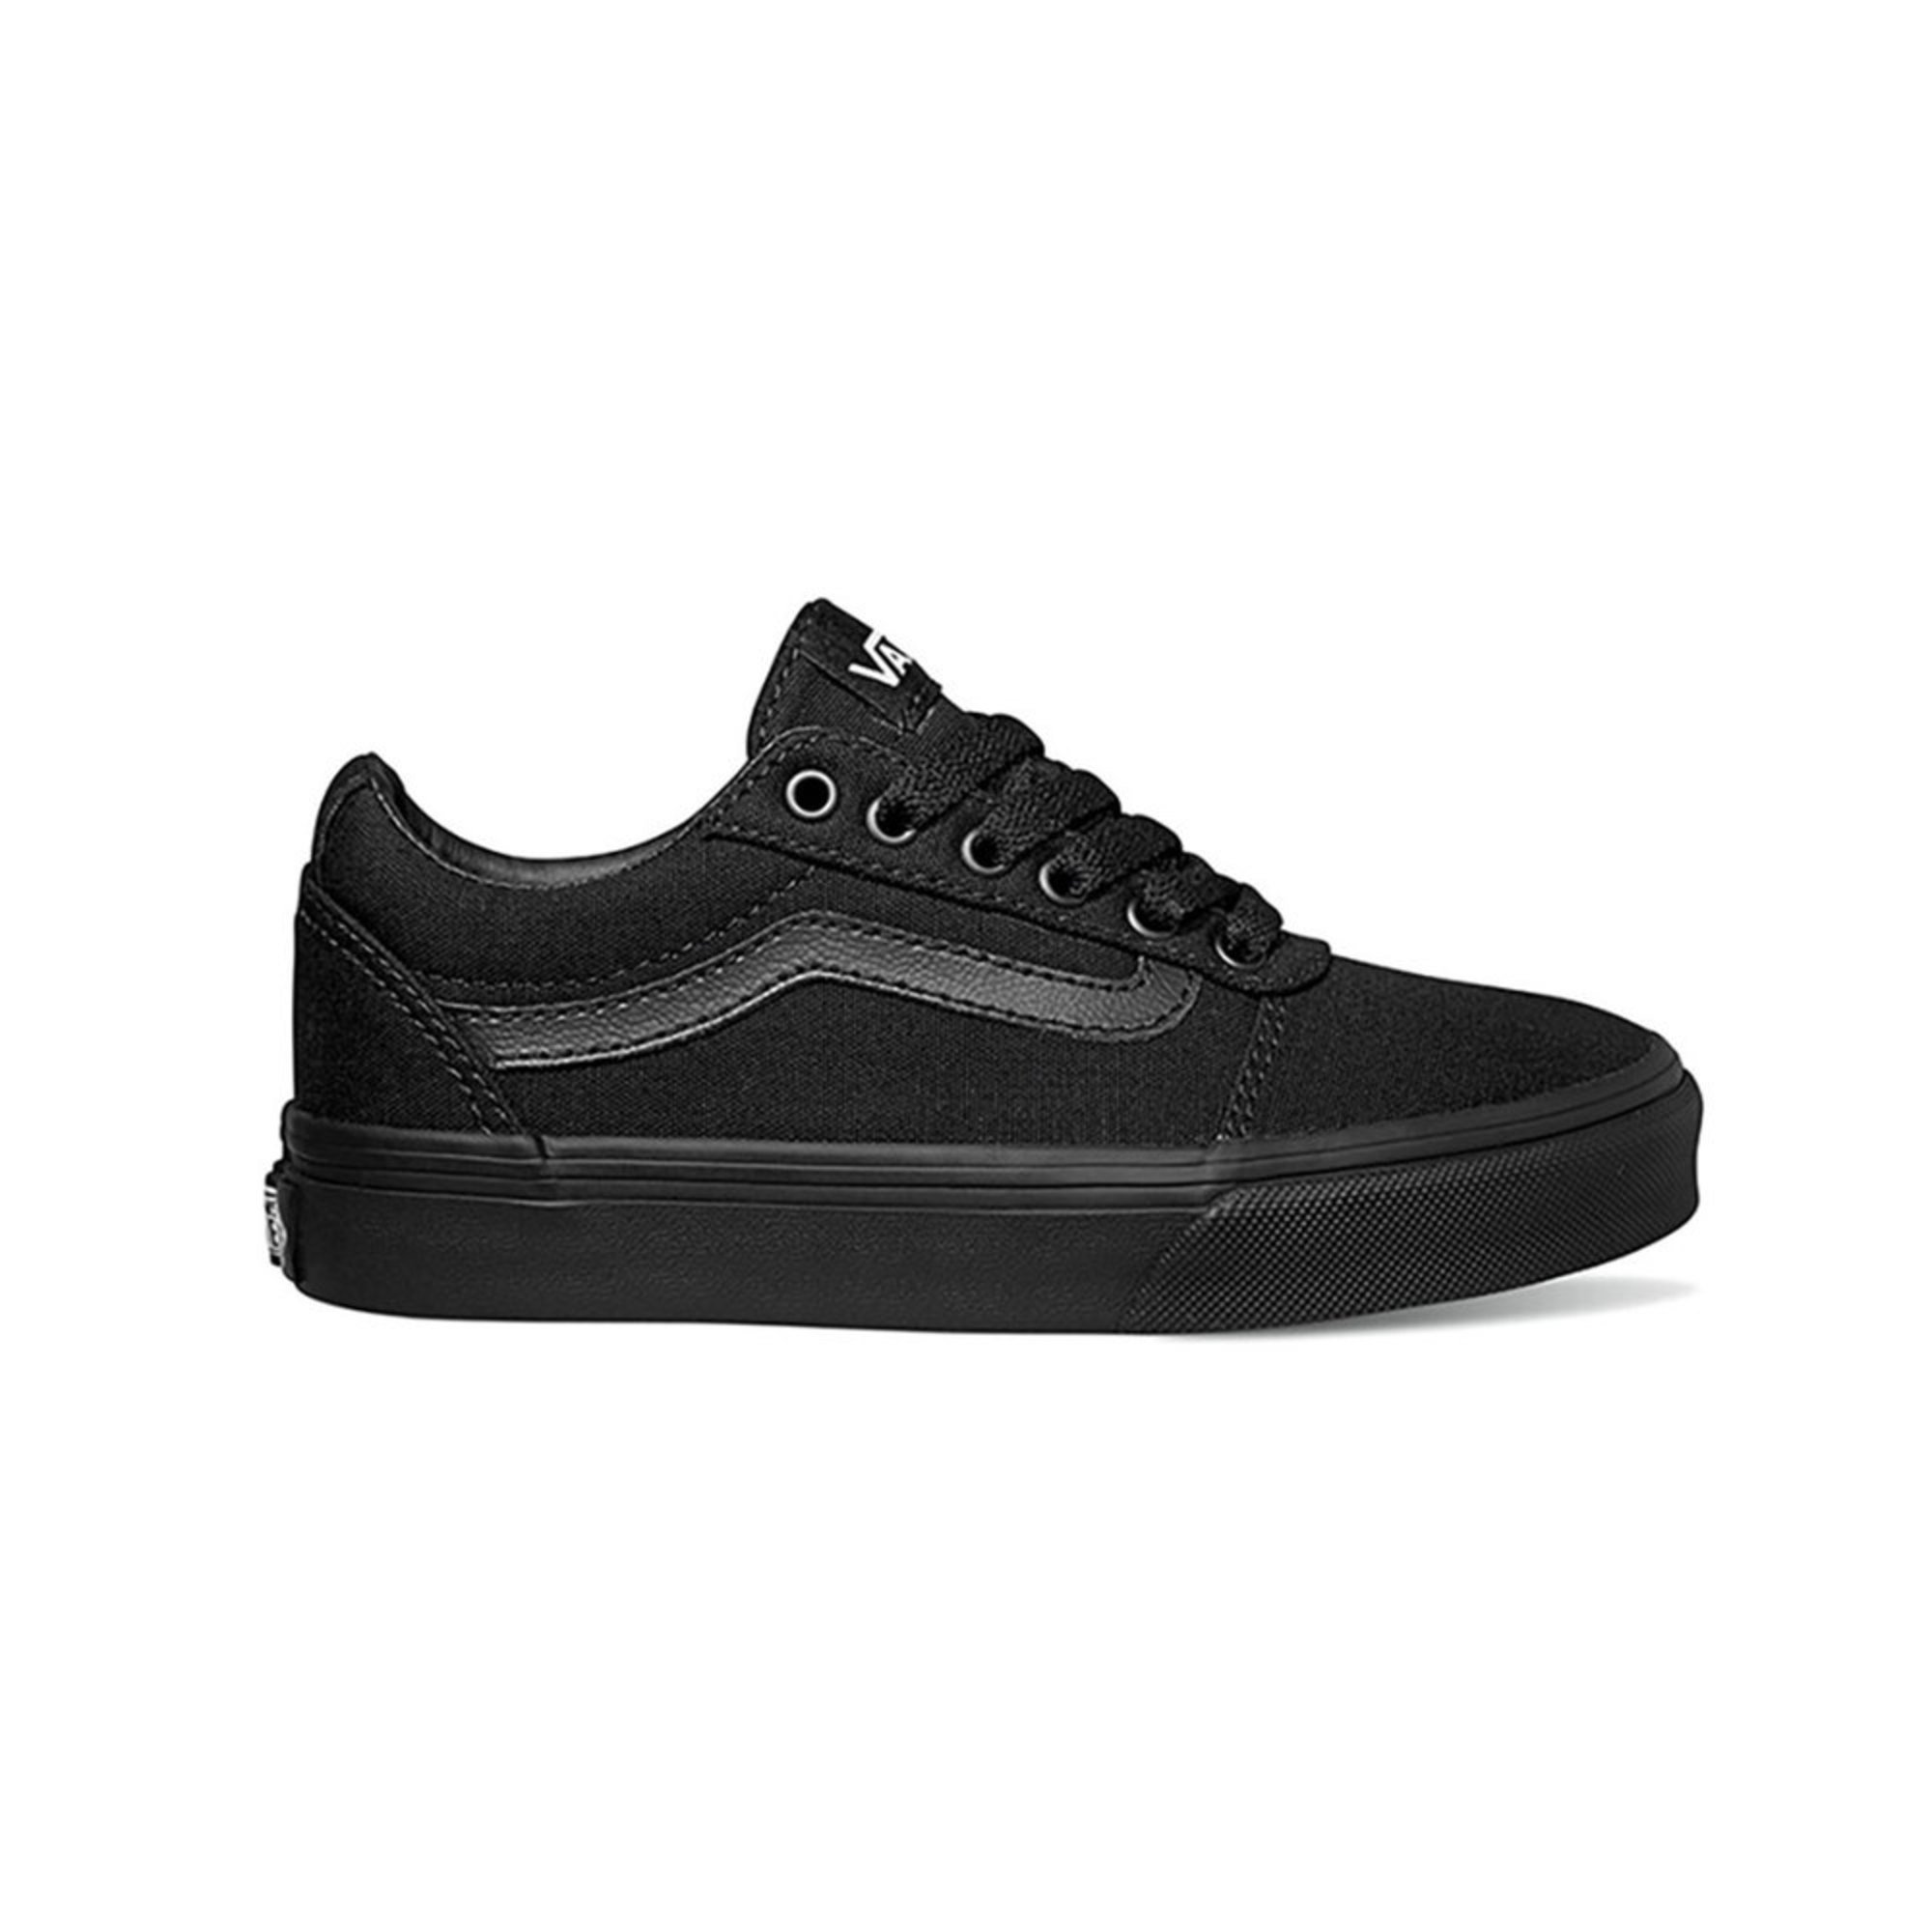 cc46116a3482a1 Vans Boys Yt Ward Canvas Skate Shoe (little Kid)